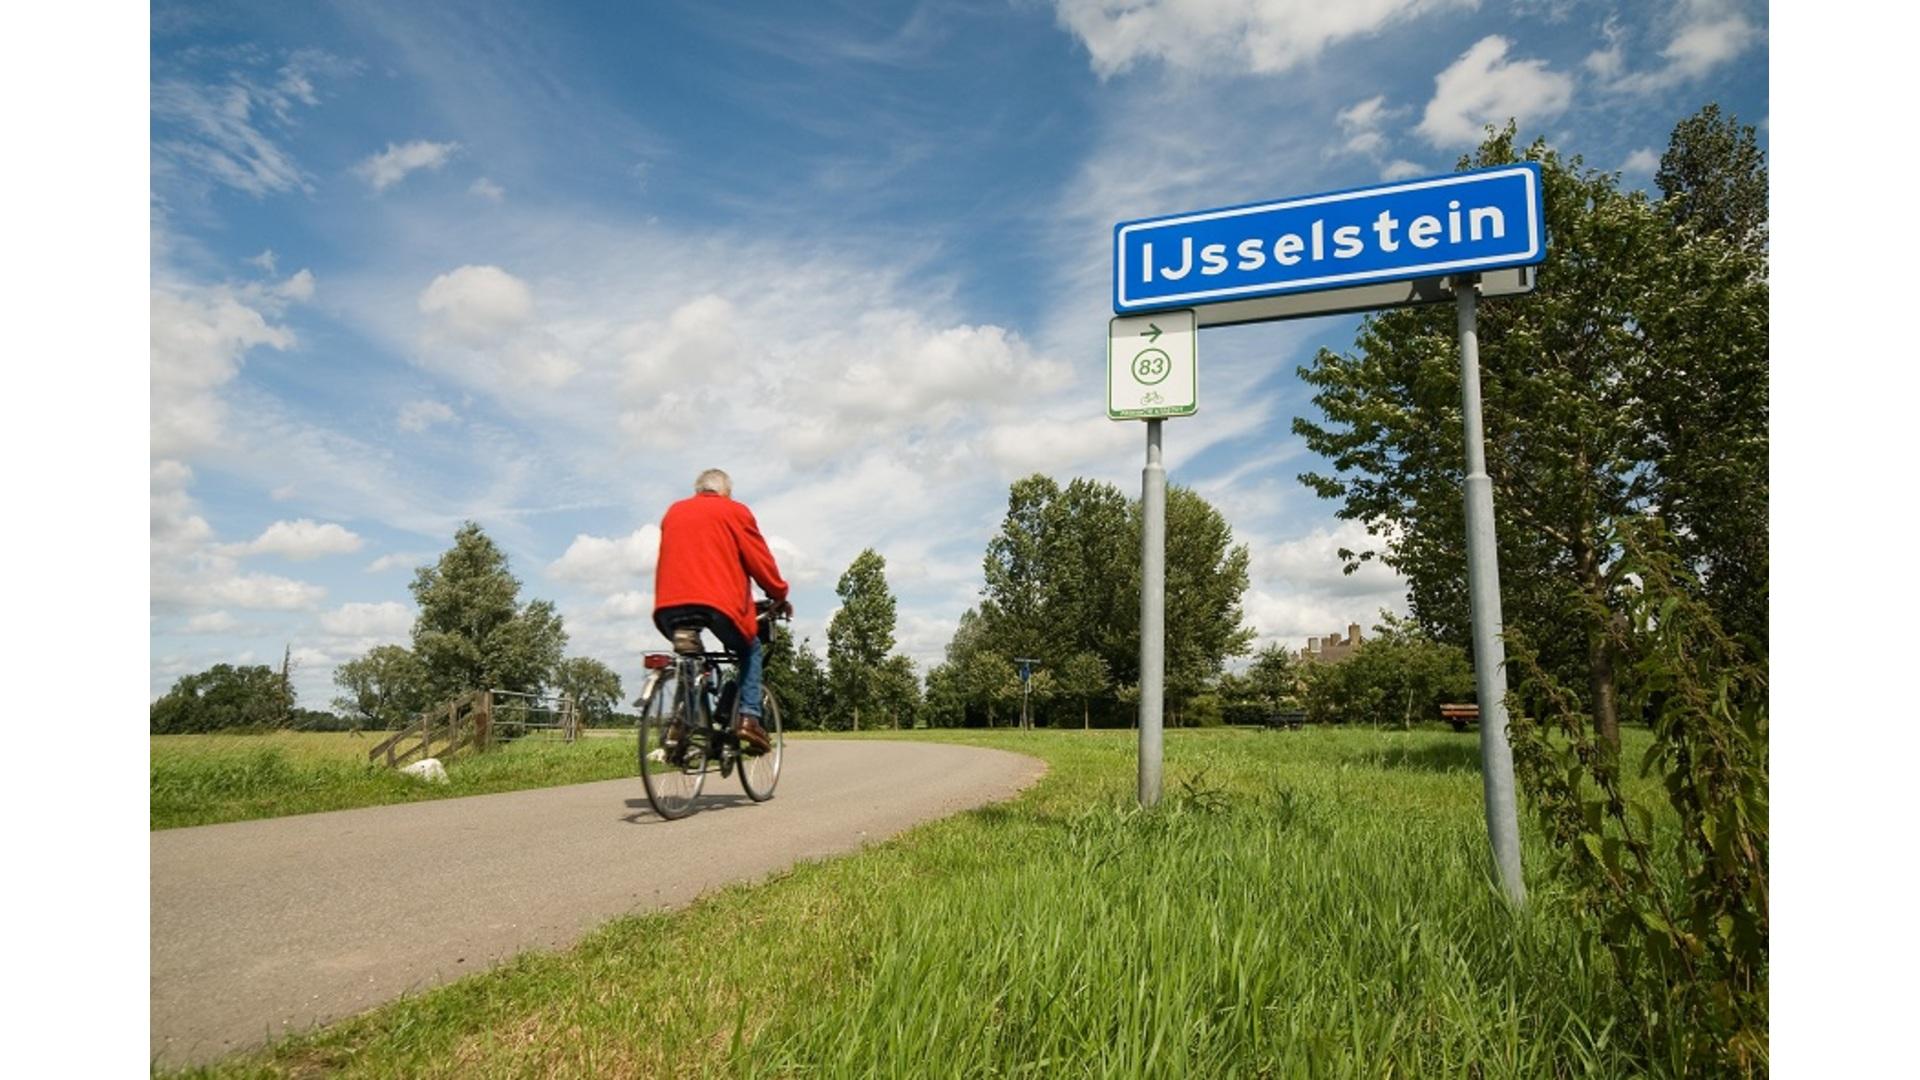 Gemeente IJsselstein